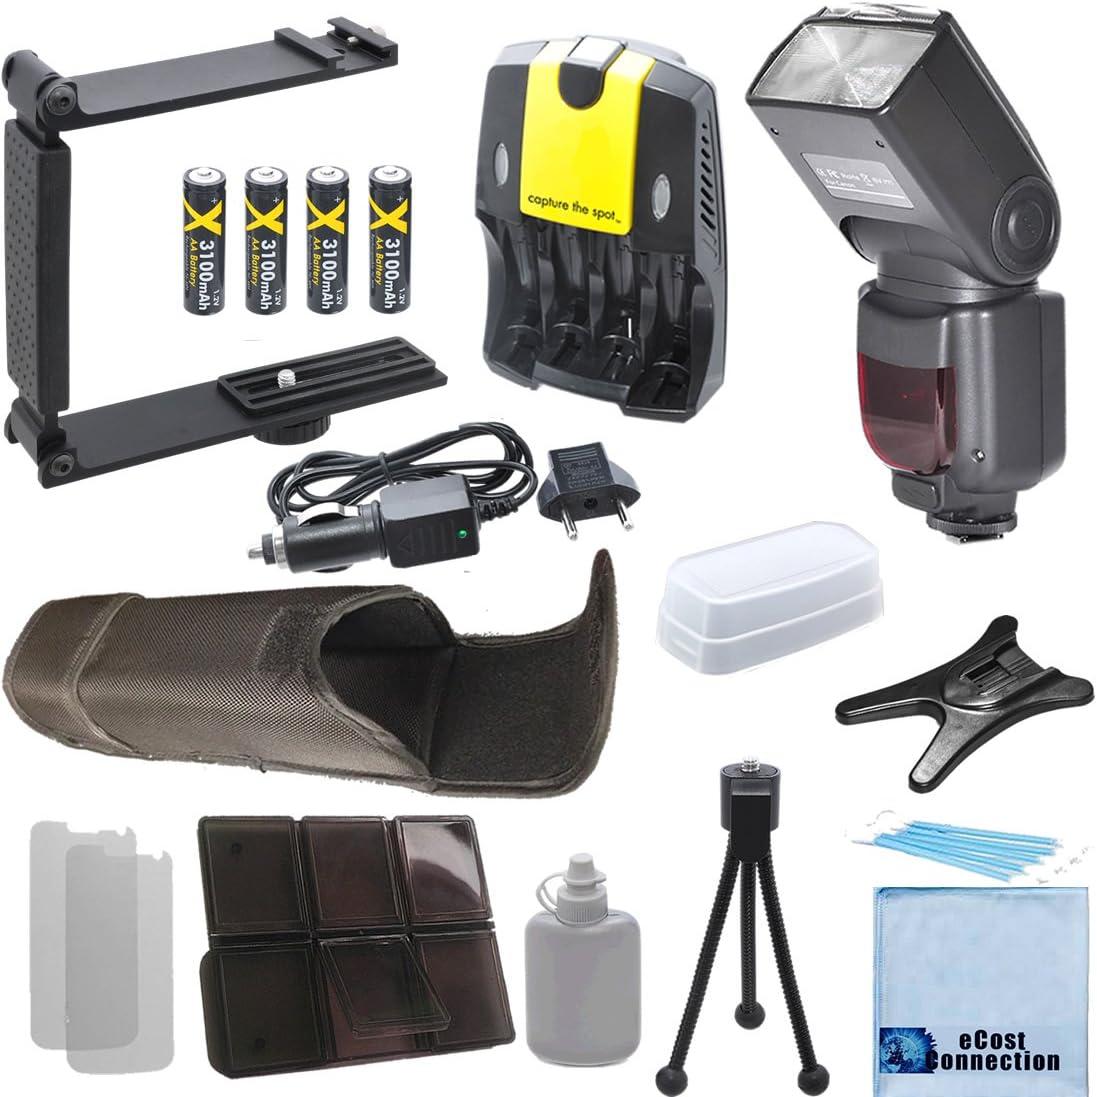 Digital Auto Power Zoom Auto-Focus Flash w//LCD Display f//Nikon Universal Mini Portable Folding Bracket Deluxe Accessories Kit for Nikon DSLR Camera 4 AA Battery Charger